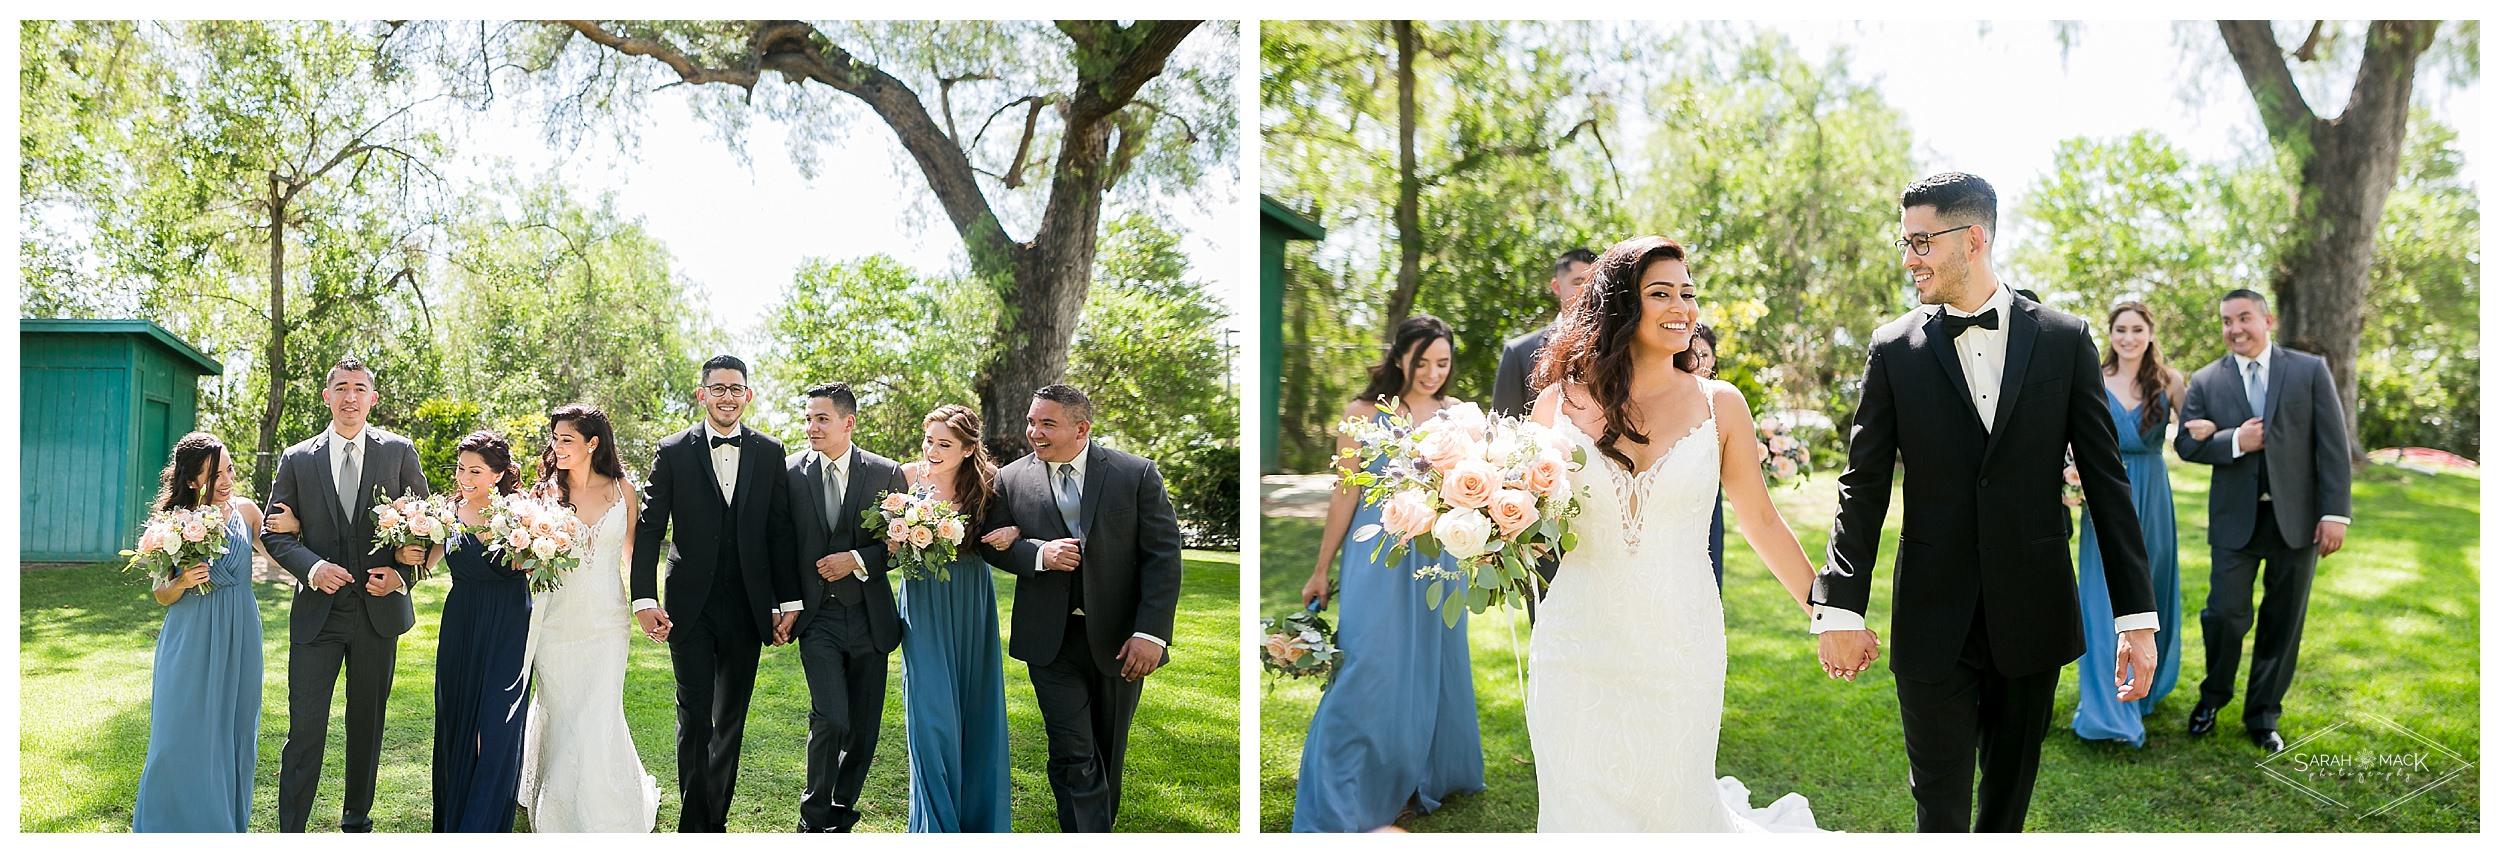 IA-Alta-Vista-Country-Club-Yorba-Linda-Wedding-Photography 216.jpg